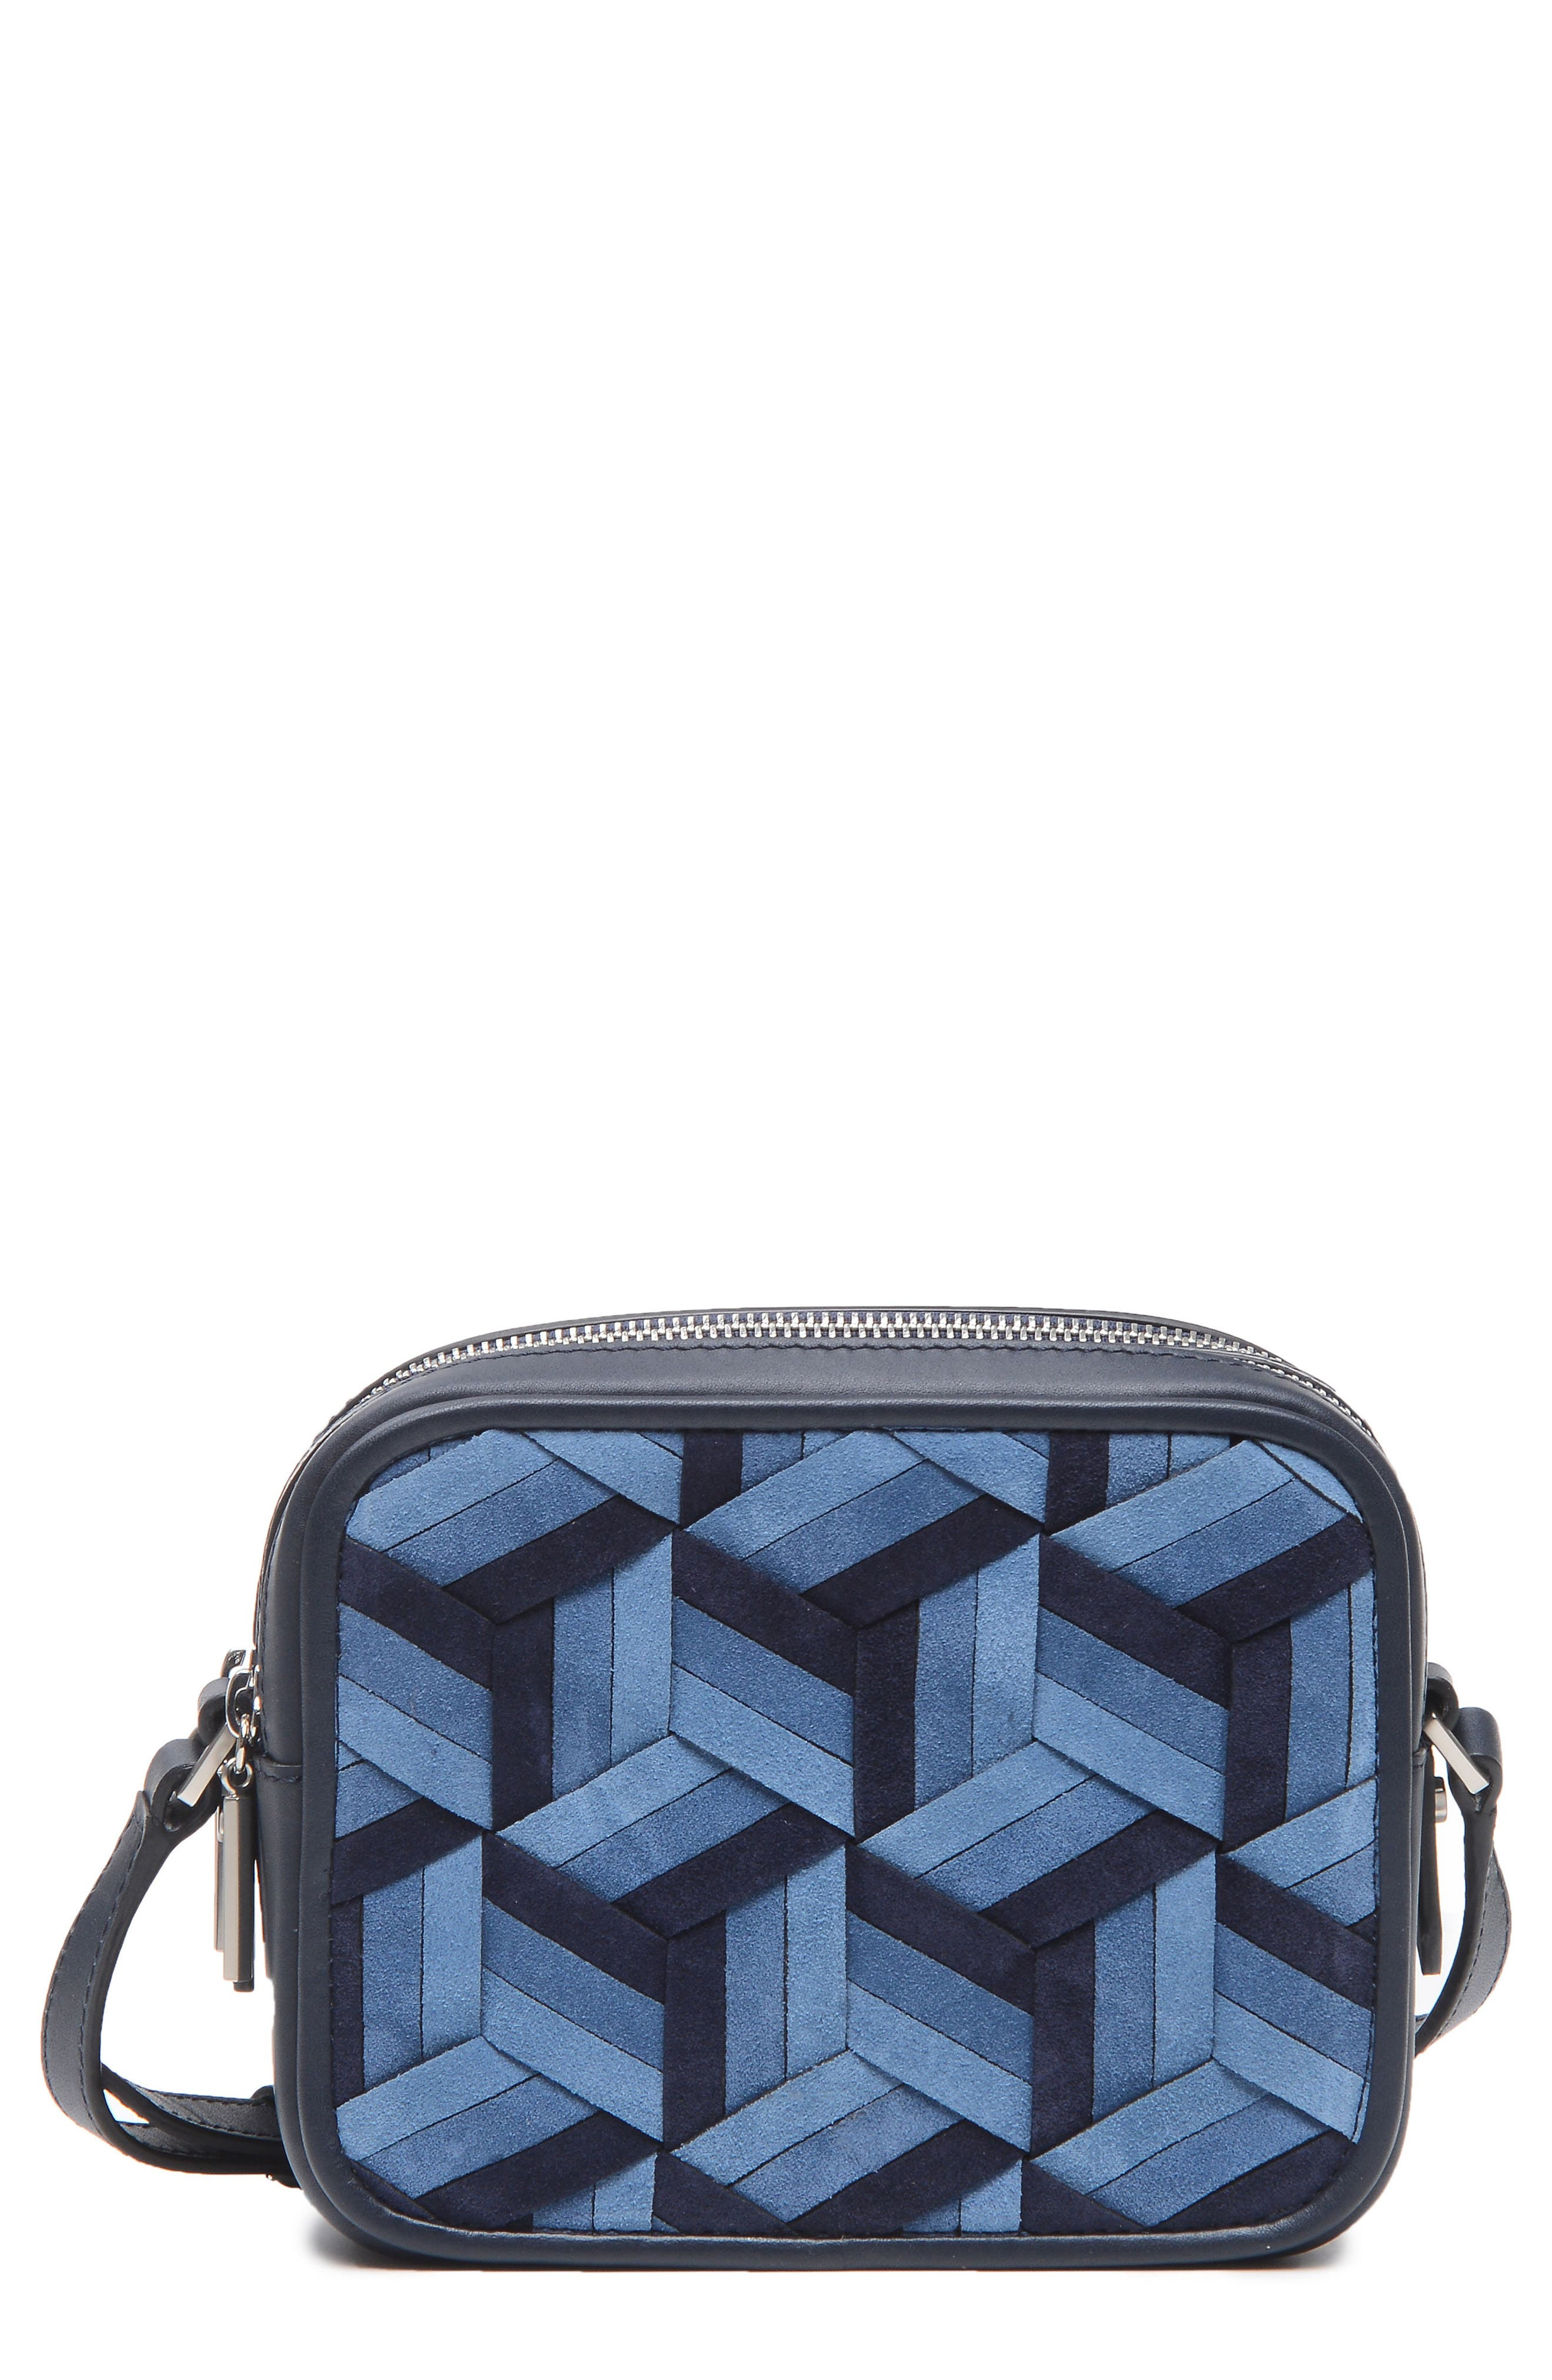 Explorer Woven Leather Camera Bag,                             Main thumbnail 1, color,                             Navy/ Ocean/ Sky